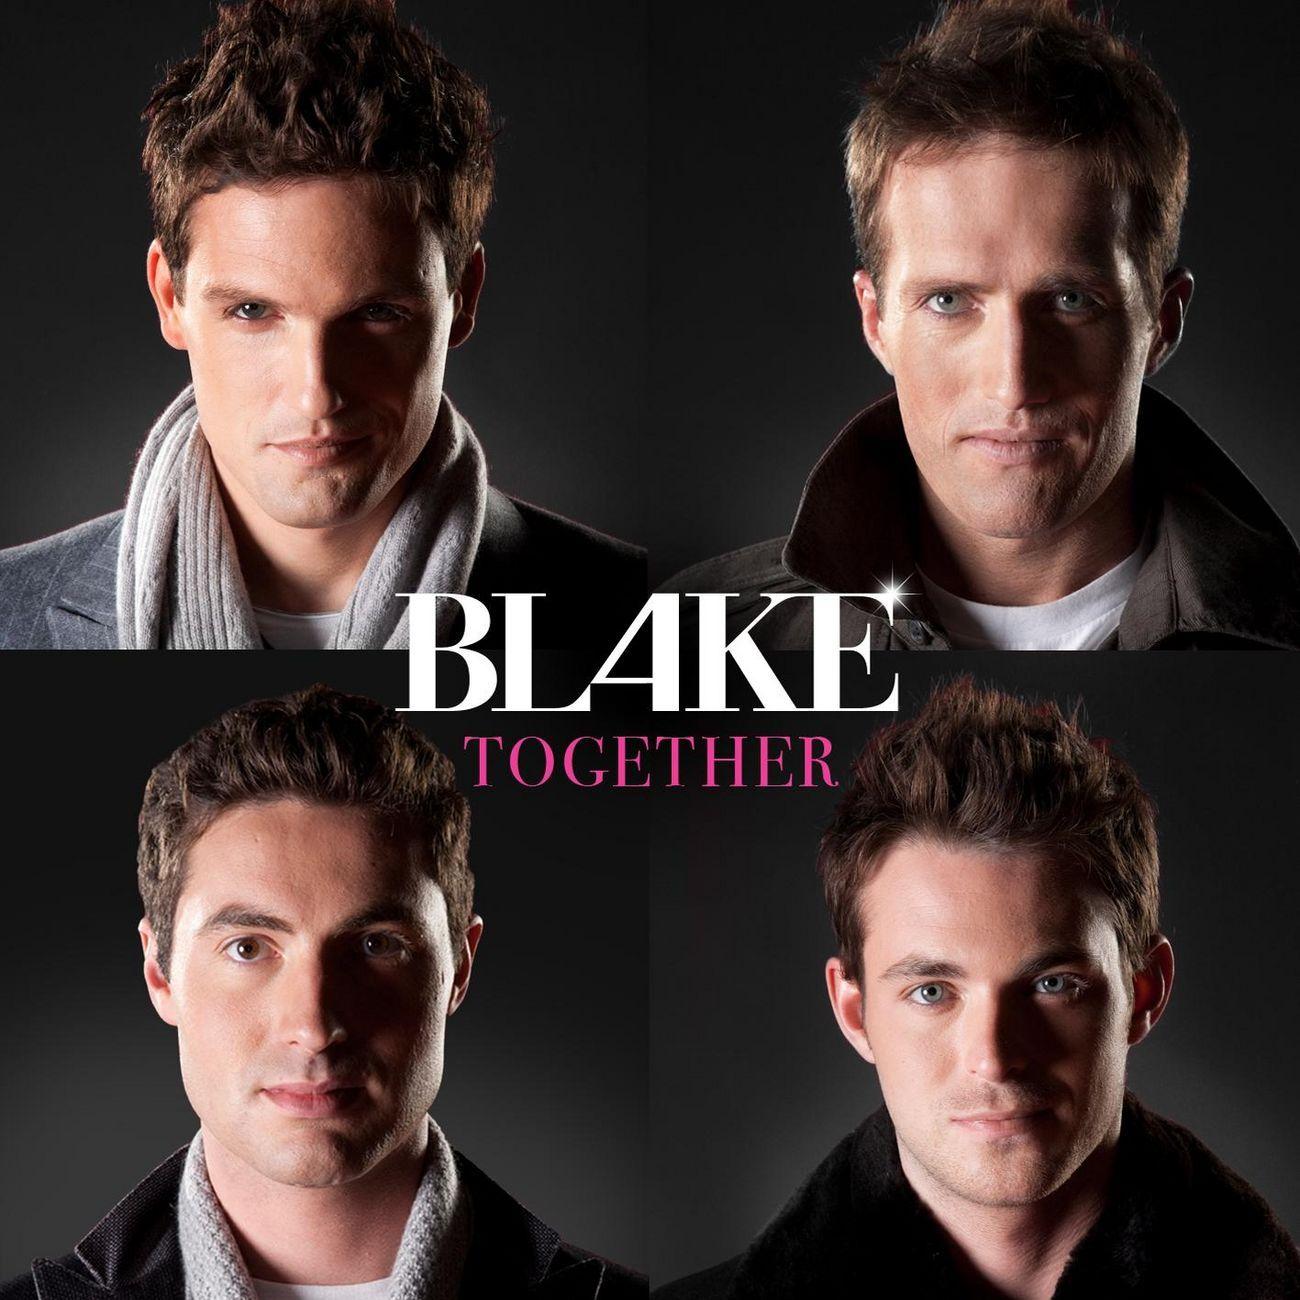 Blake - Together album cover